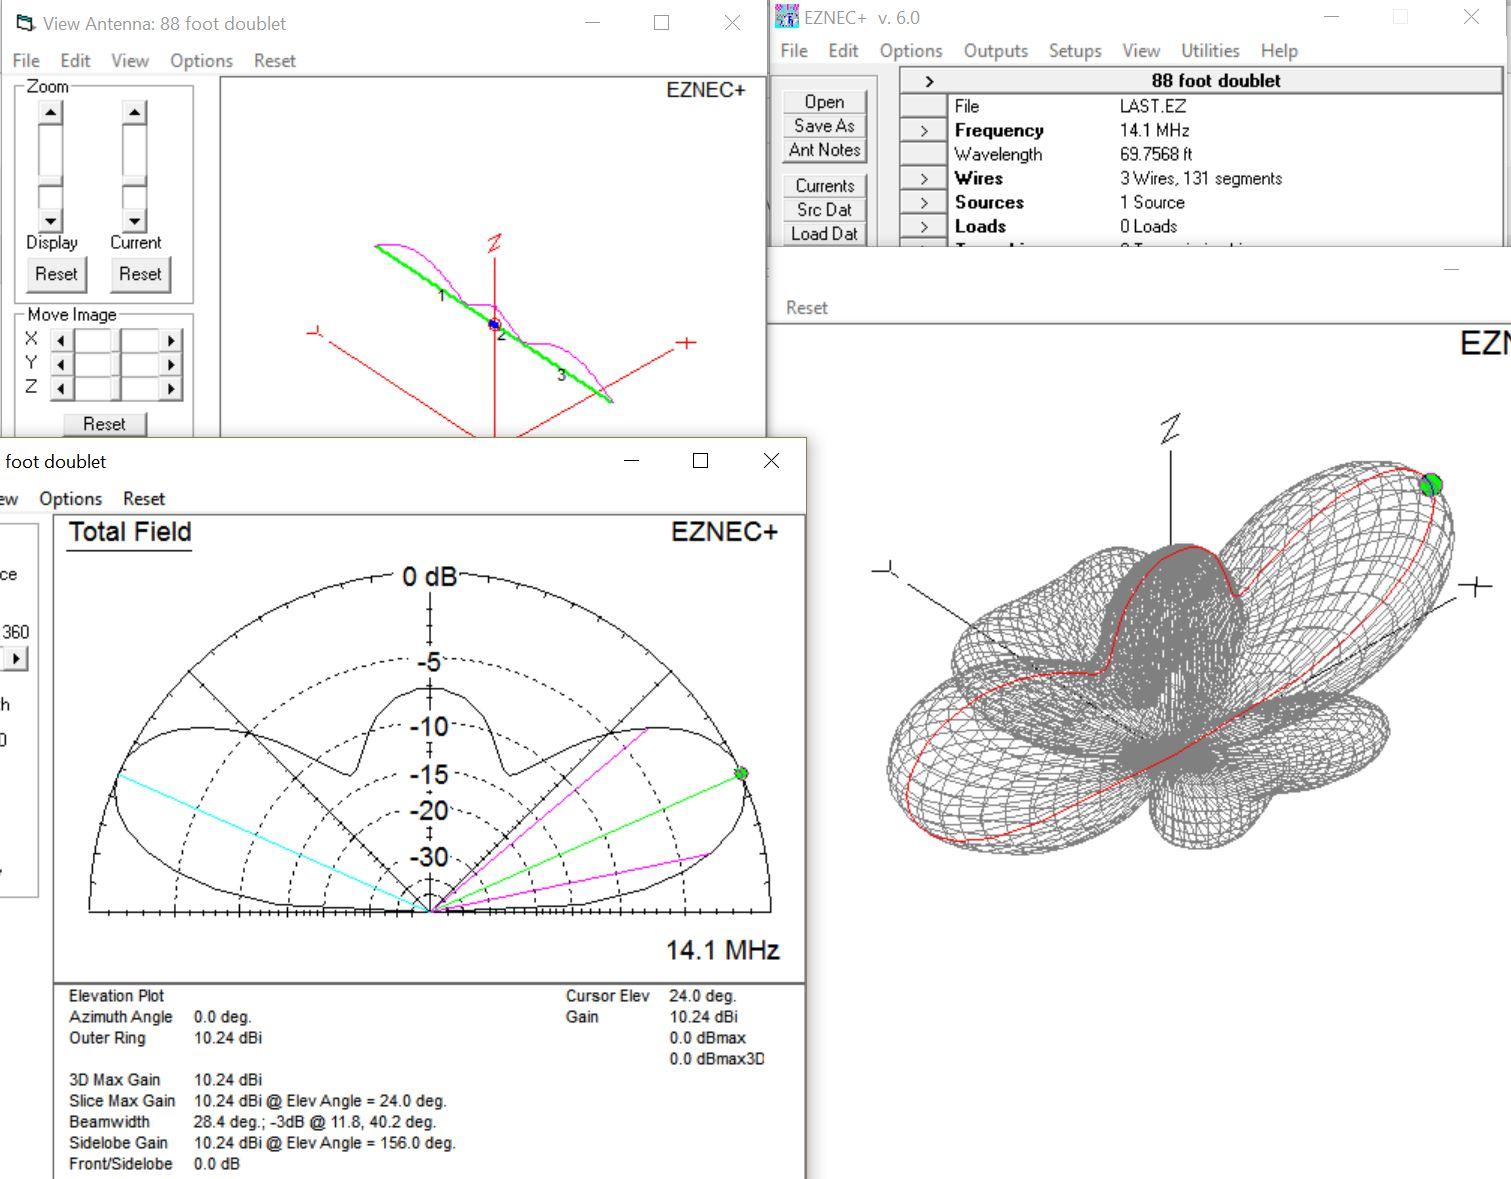 88 Foot Doublet 20m Patterns | WV0H Myron